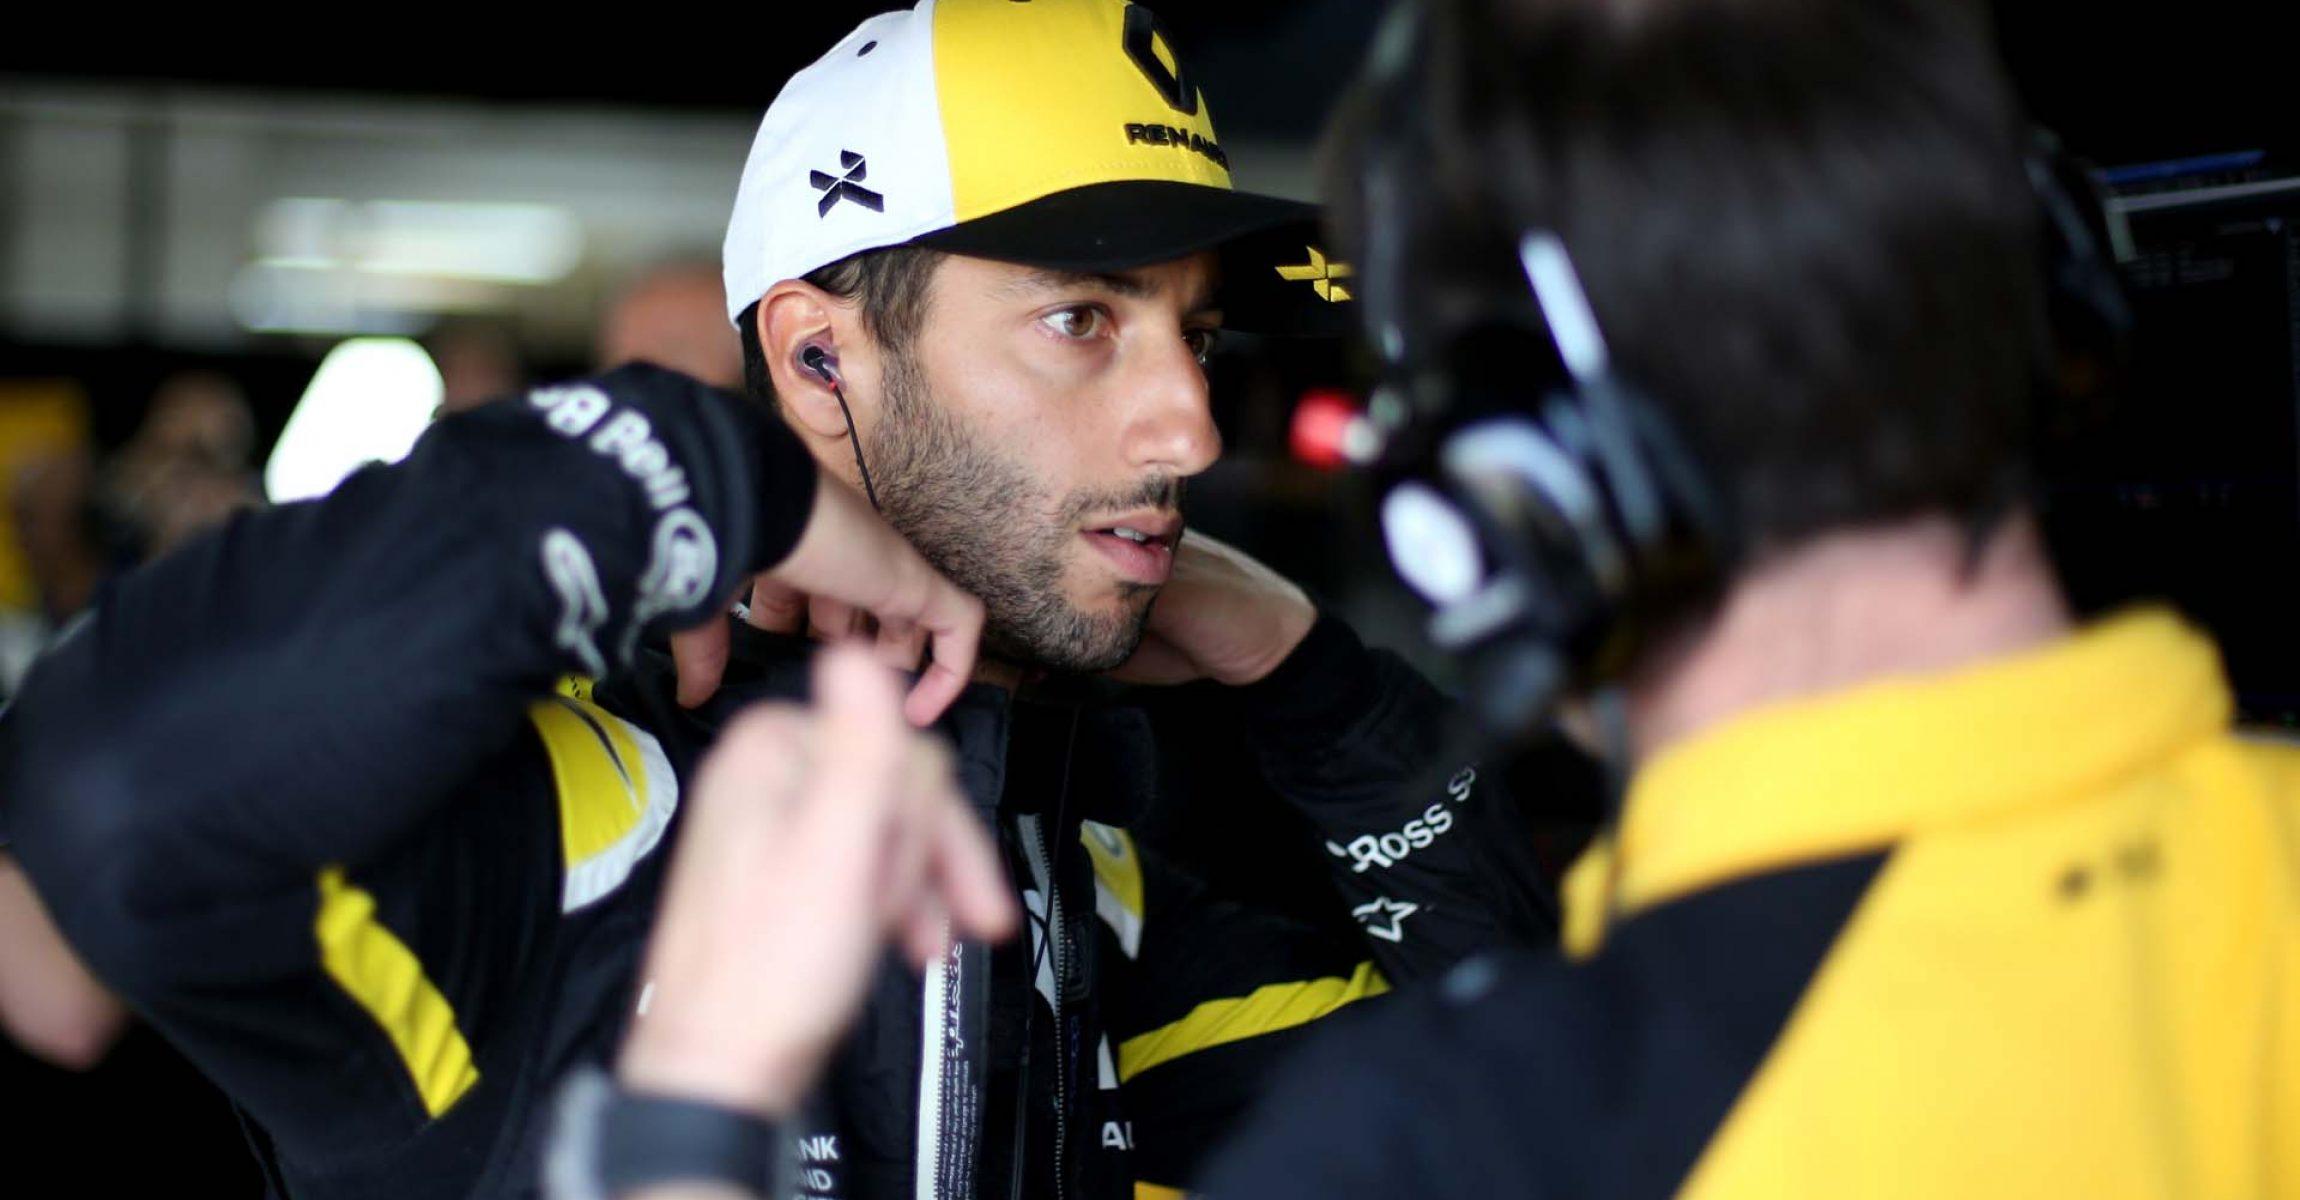 Daniel Ricciardo (AUS) Renault F1 Team. French Grand Prix, Friday 21st June 2019. Paul Ricard, France.